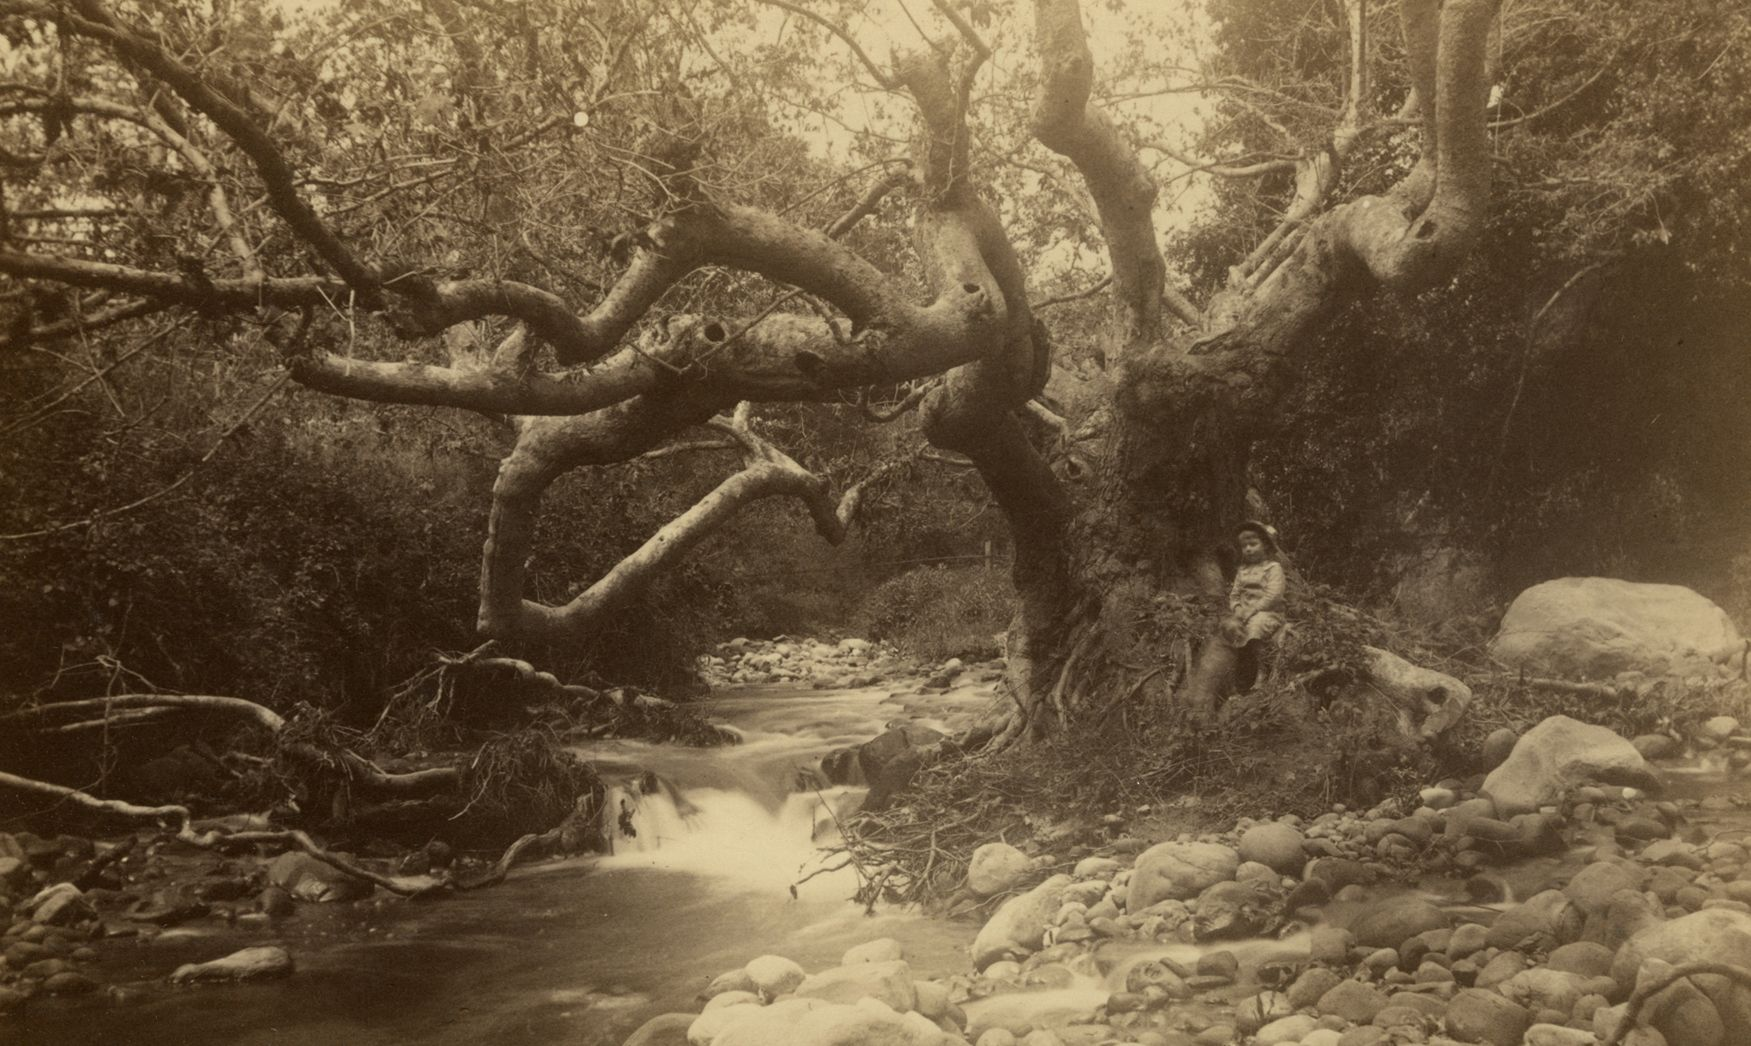 Mission Canyon, Santa Barbara, California, Archives of the ...